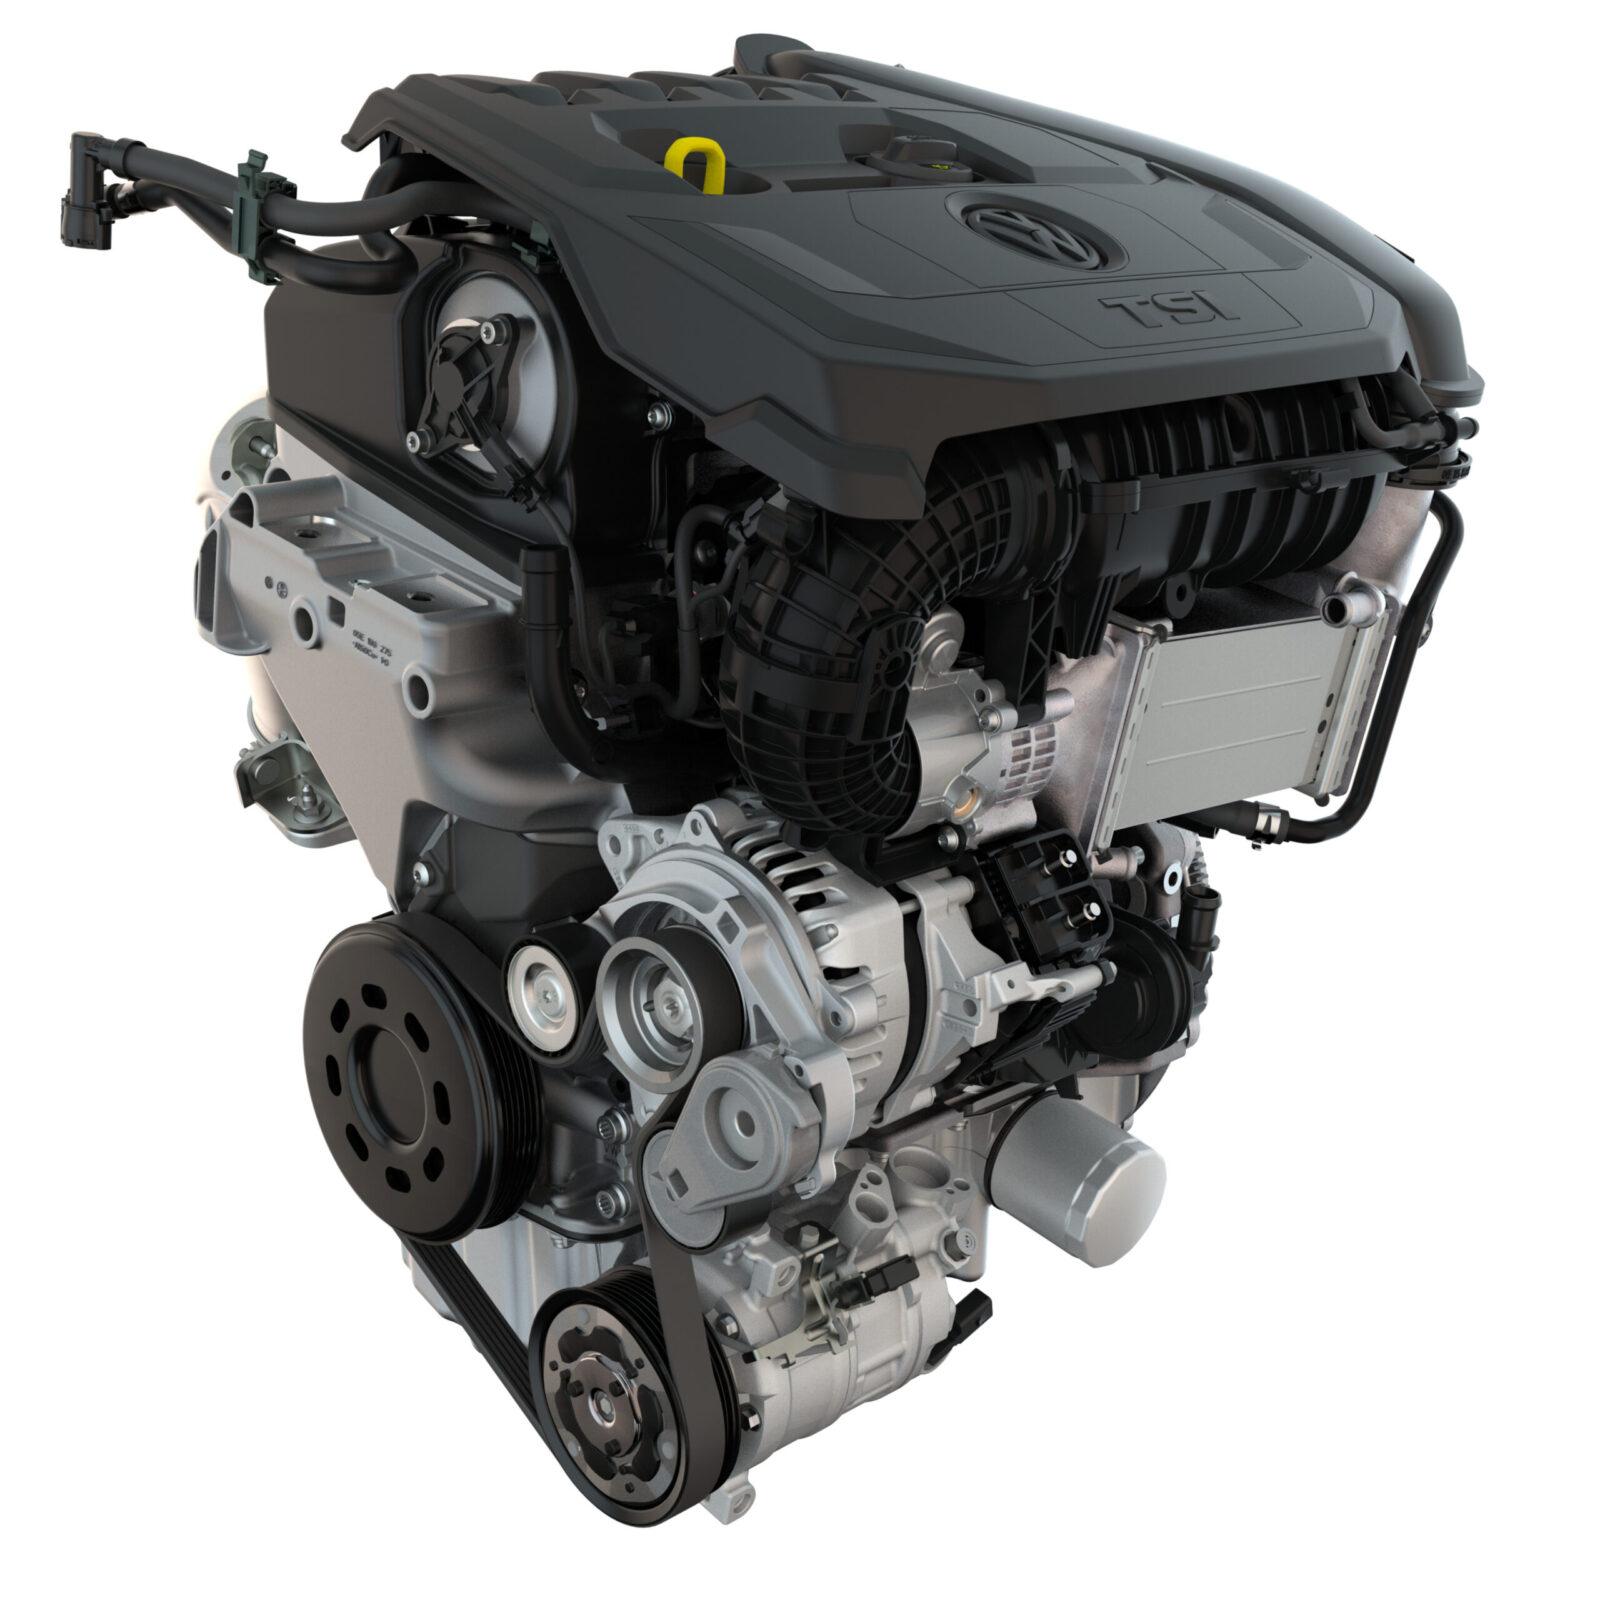 Il motore 1.5 eTSI da 150 CV